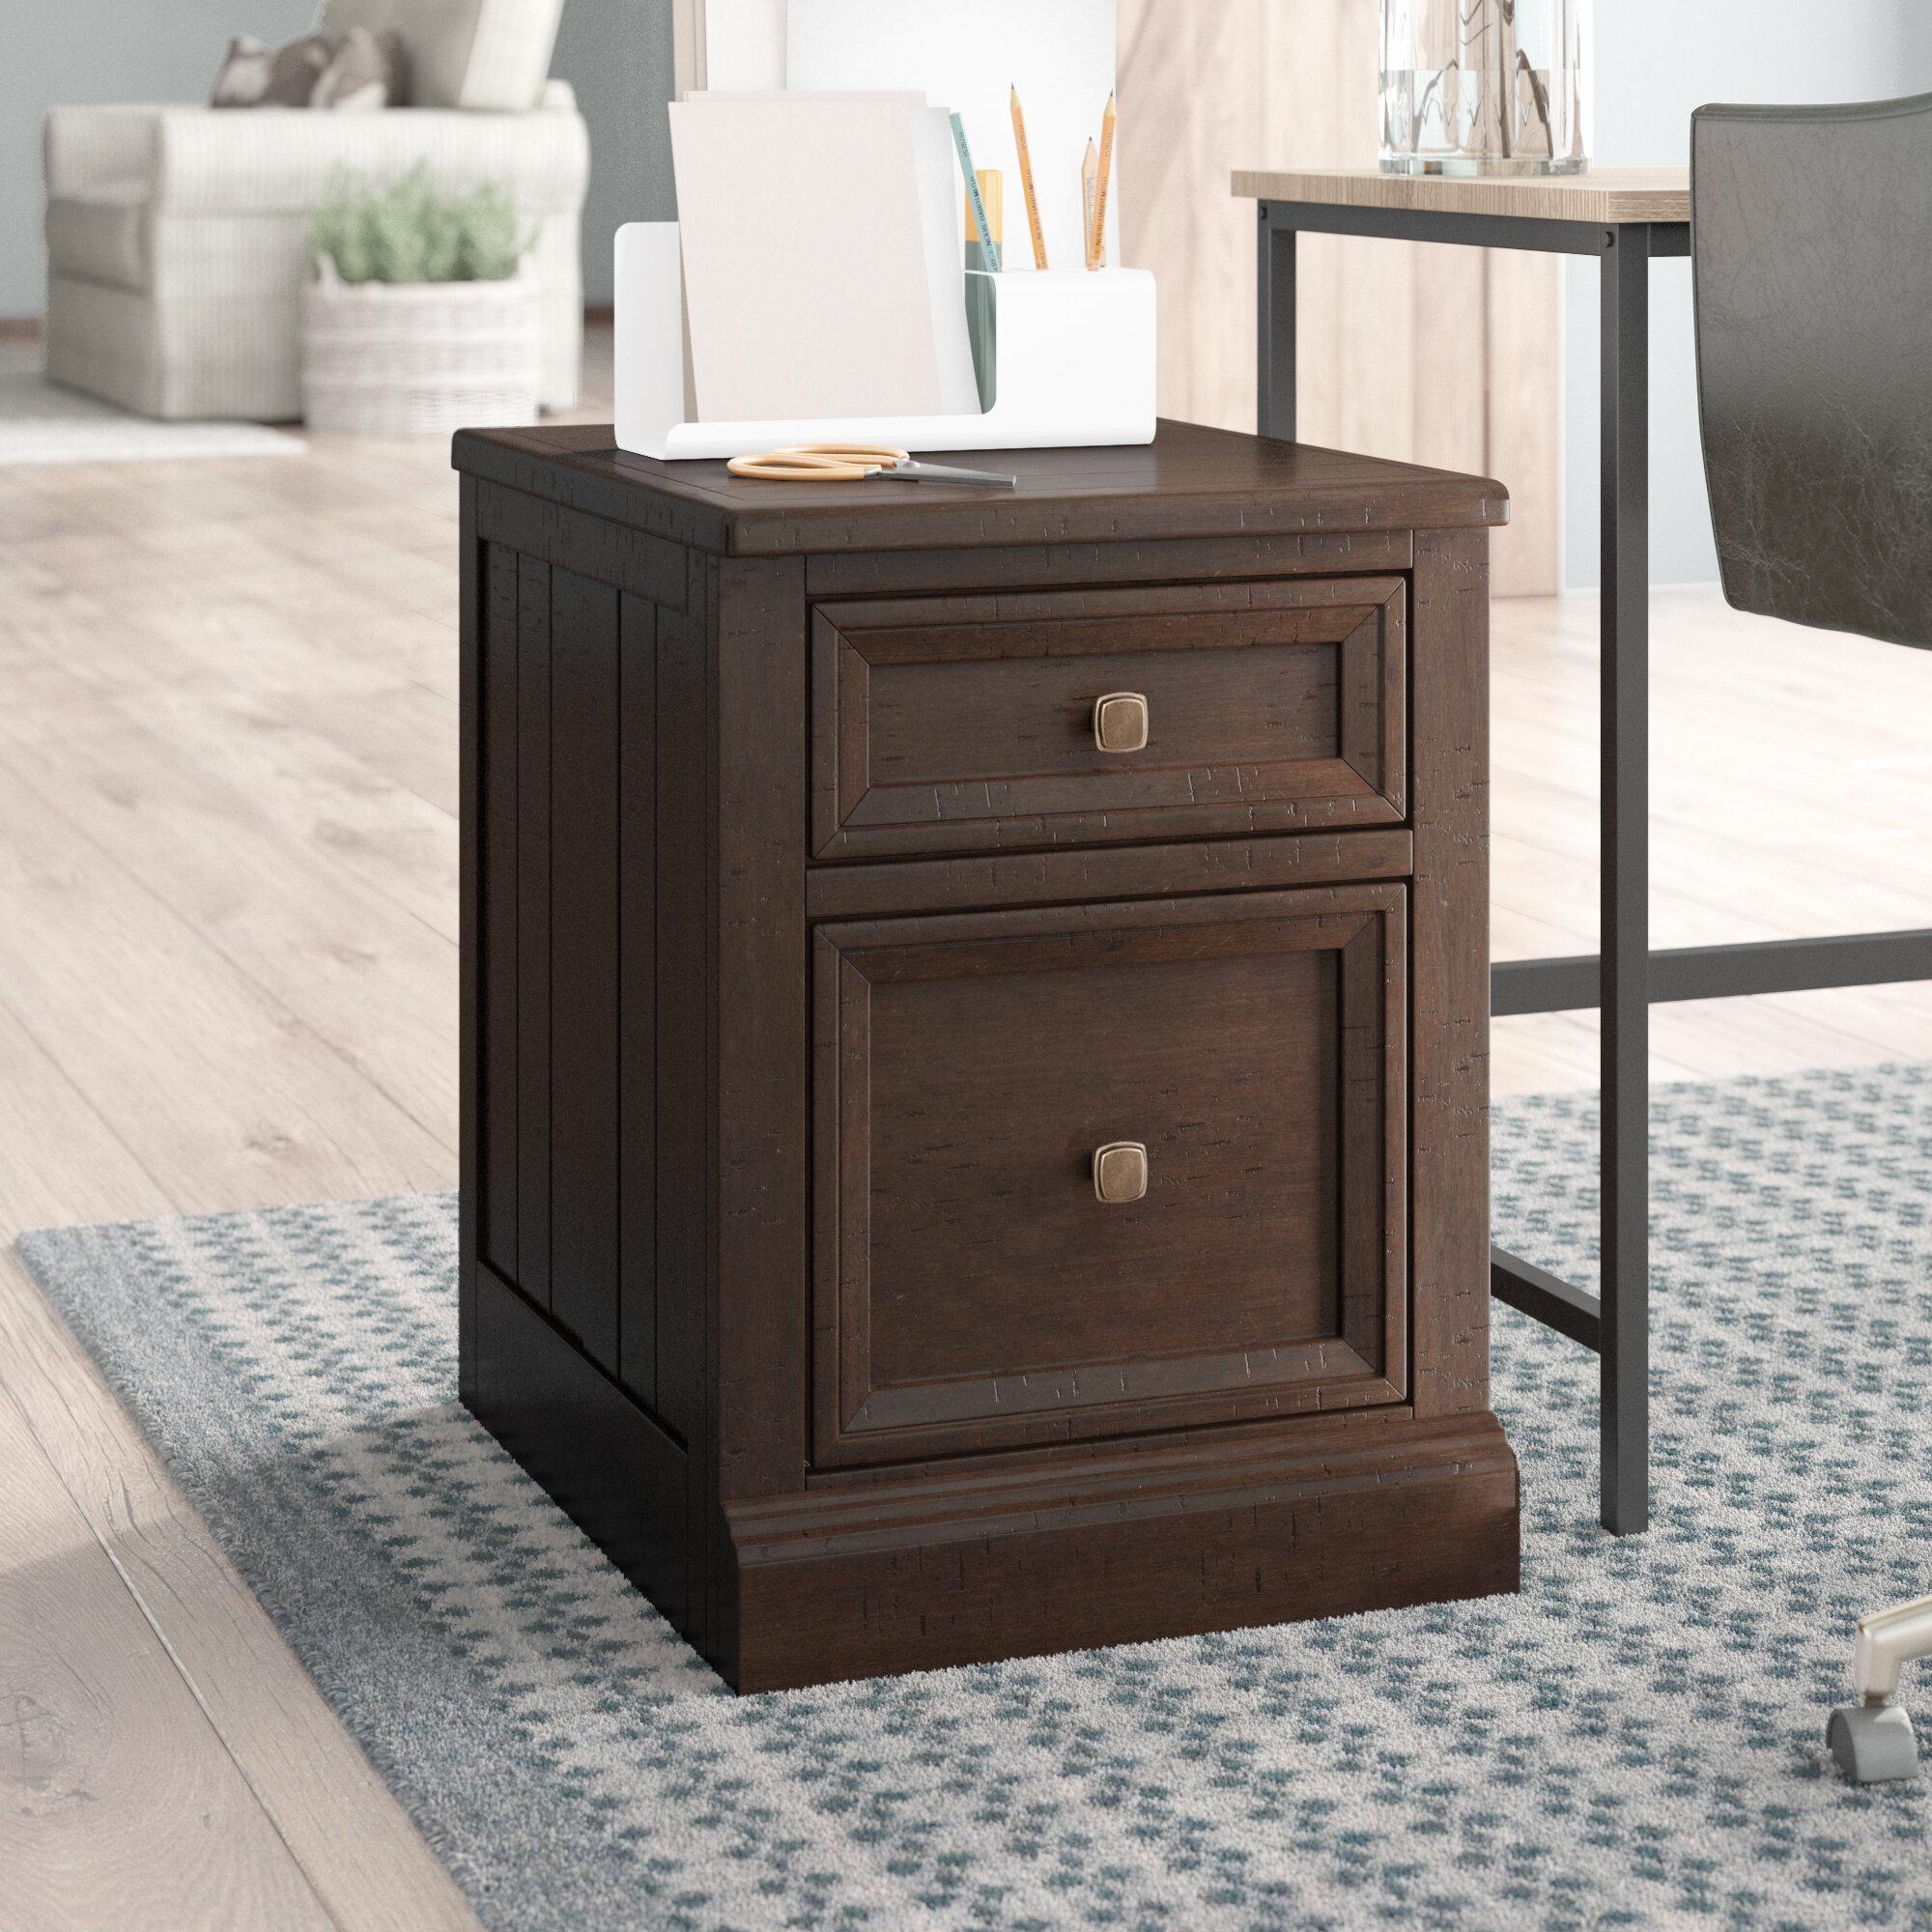 Laurel Foundry Modern Farmhouse Giroflee 2 Drawer File Cabinet Reviews Wayfair